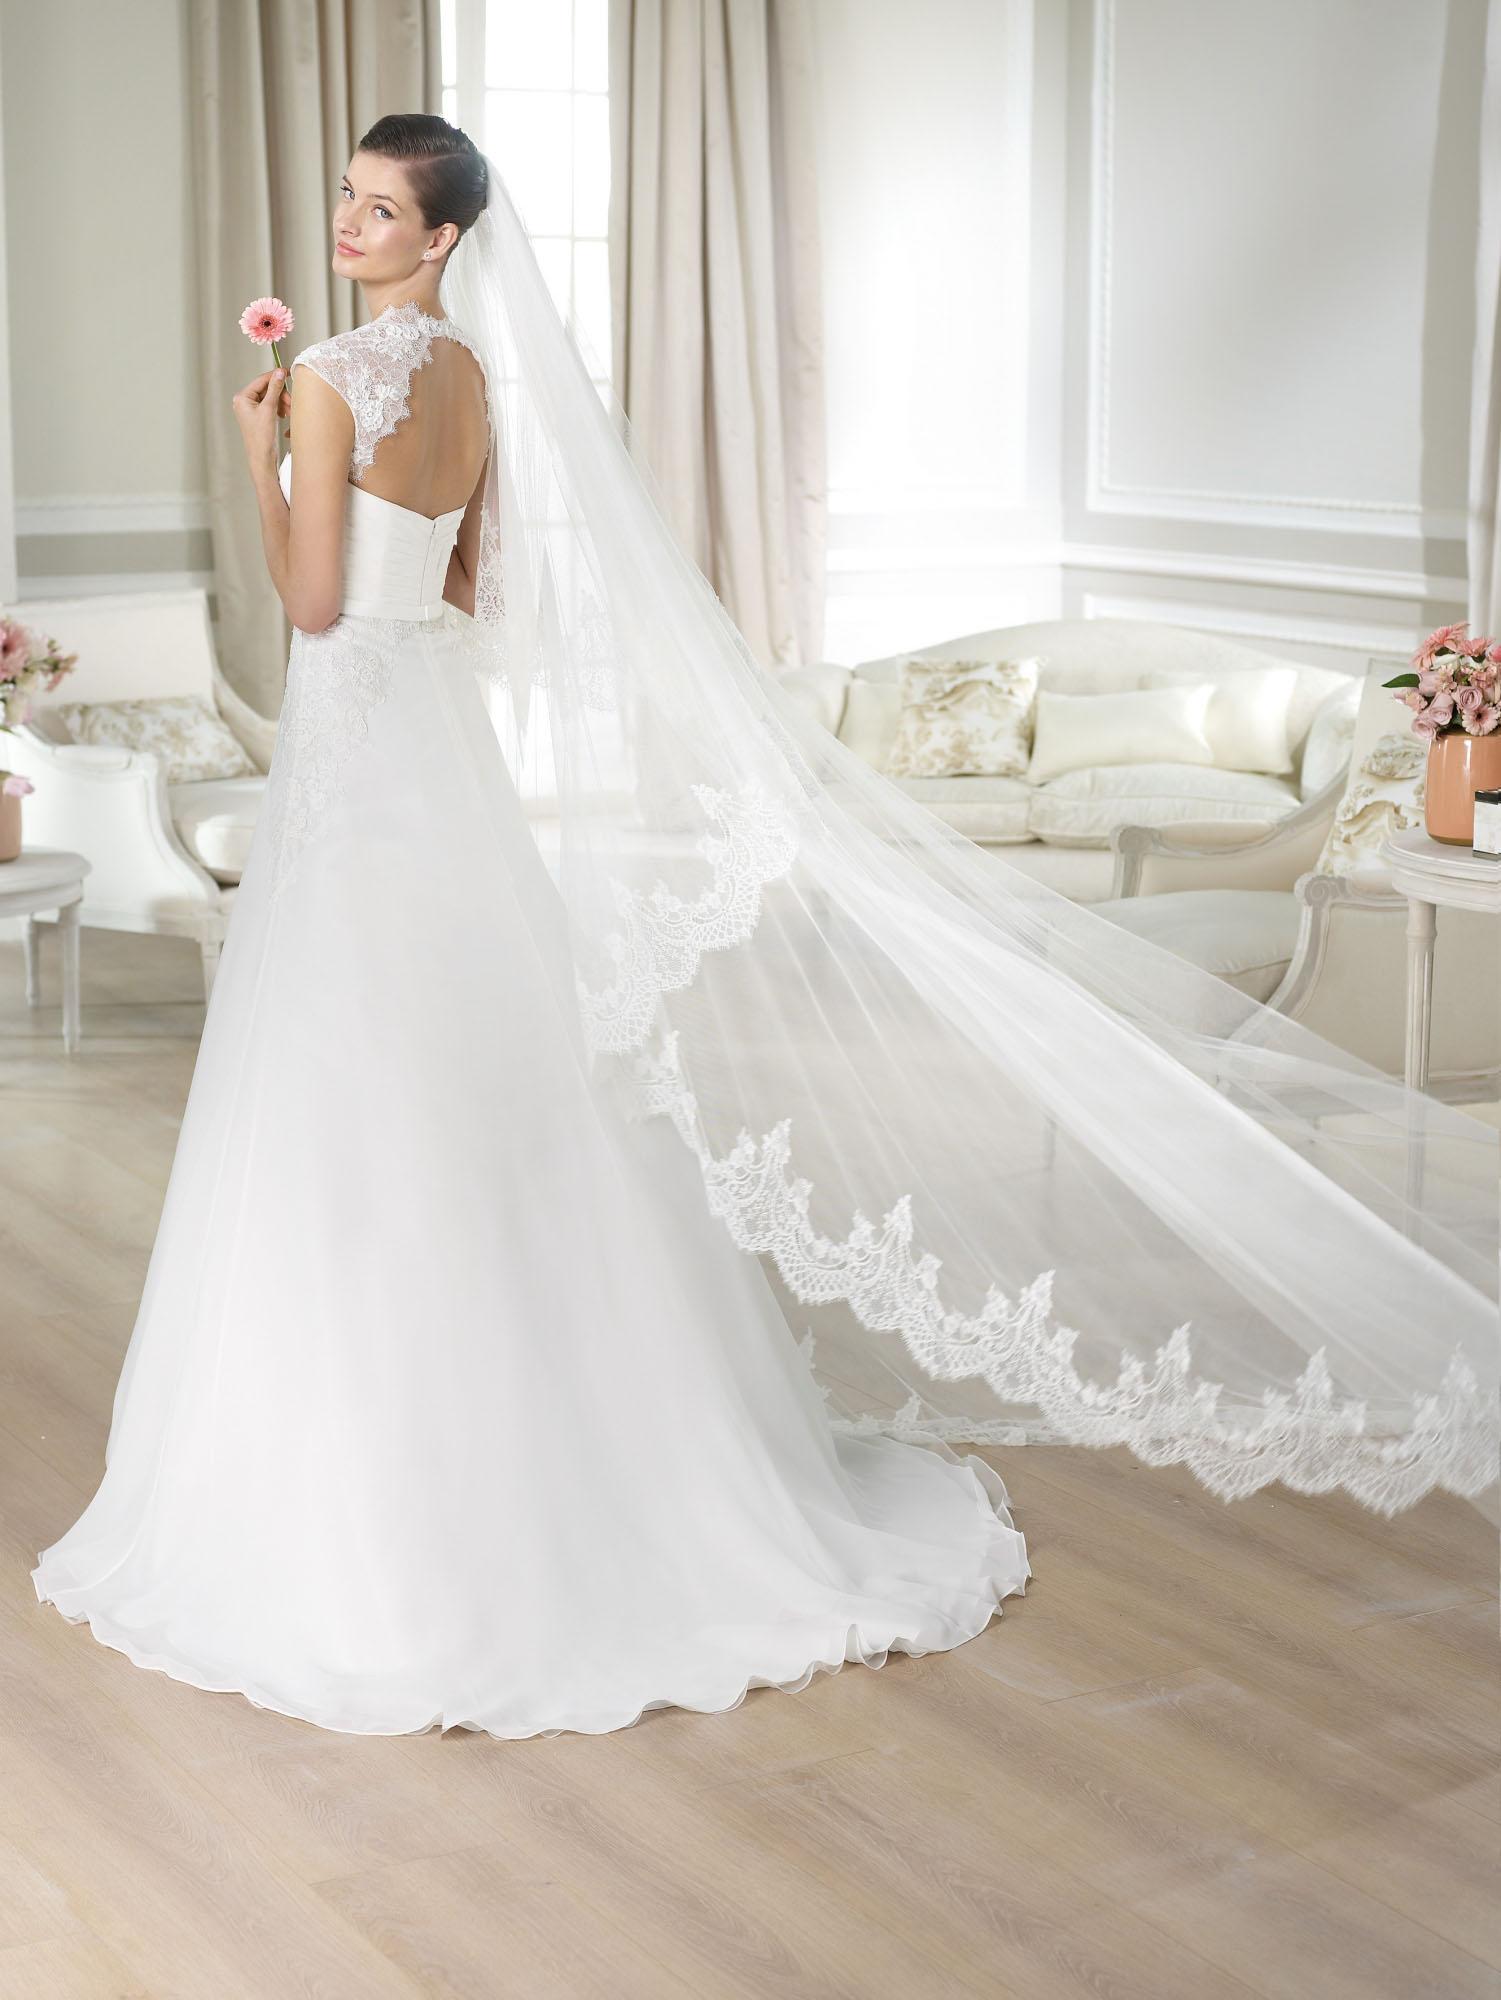 Modello Jabin  Abiti da sposa W1 White One 2014  Salem Spose